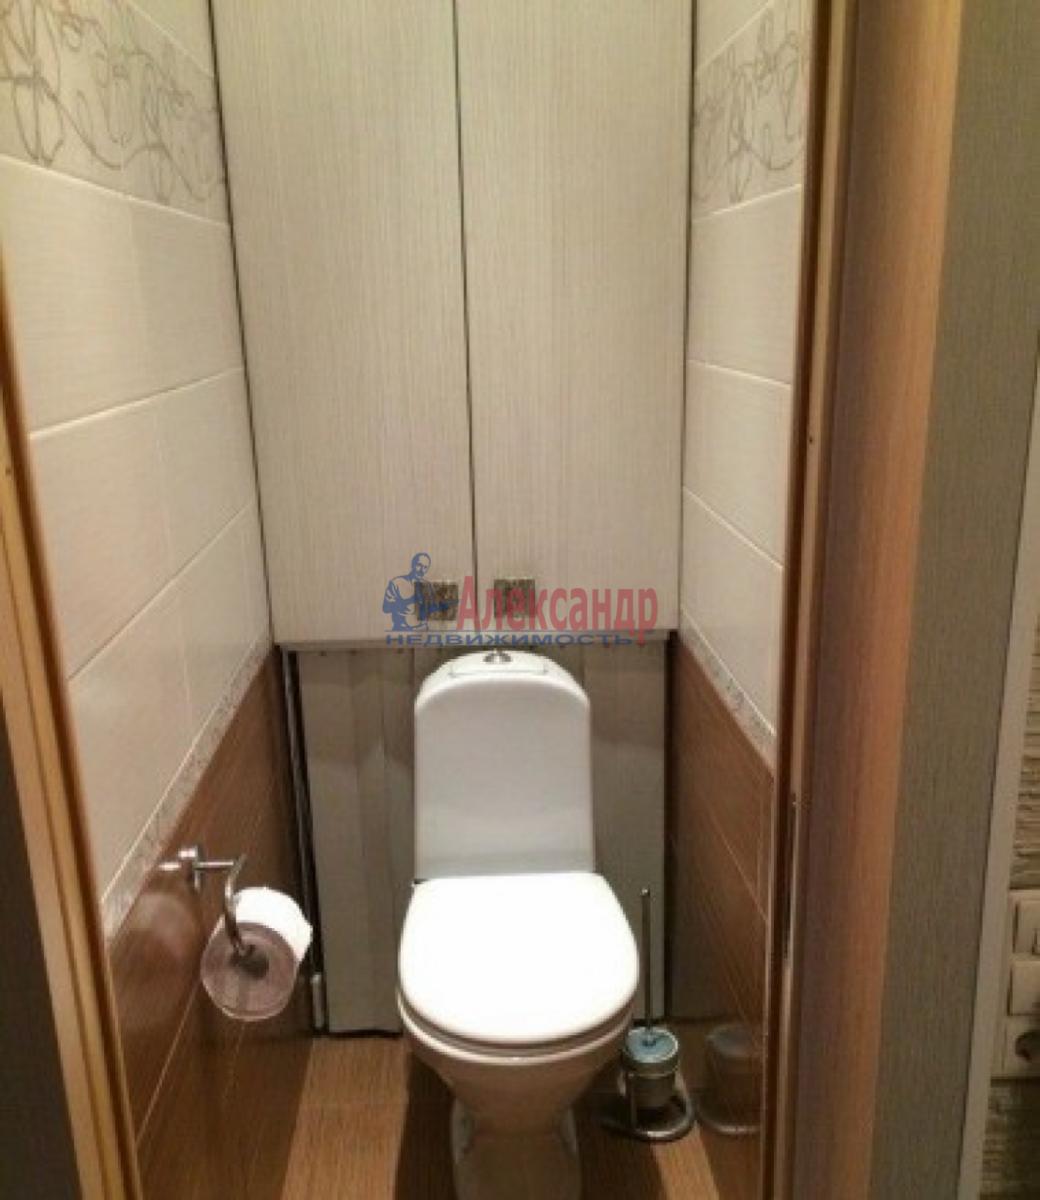 2-комнатная квартира (50м2) в аренду по адресу Ленинский пр., 176— фото 7 из 9